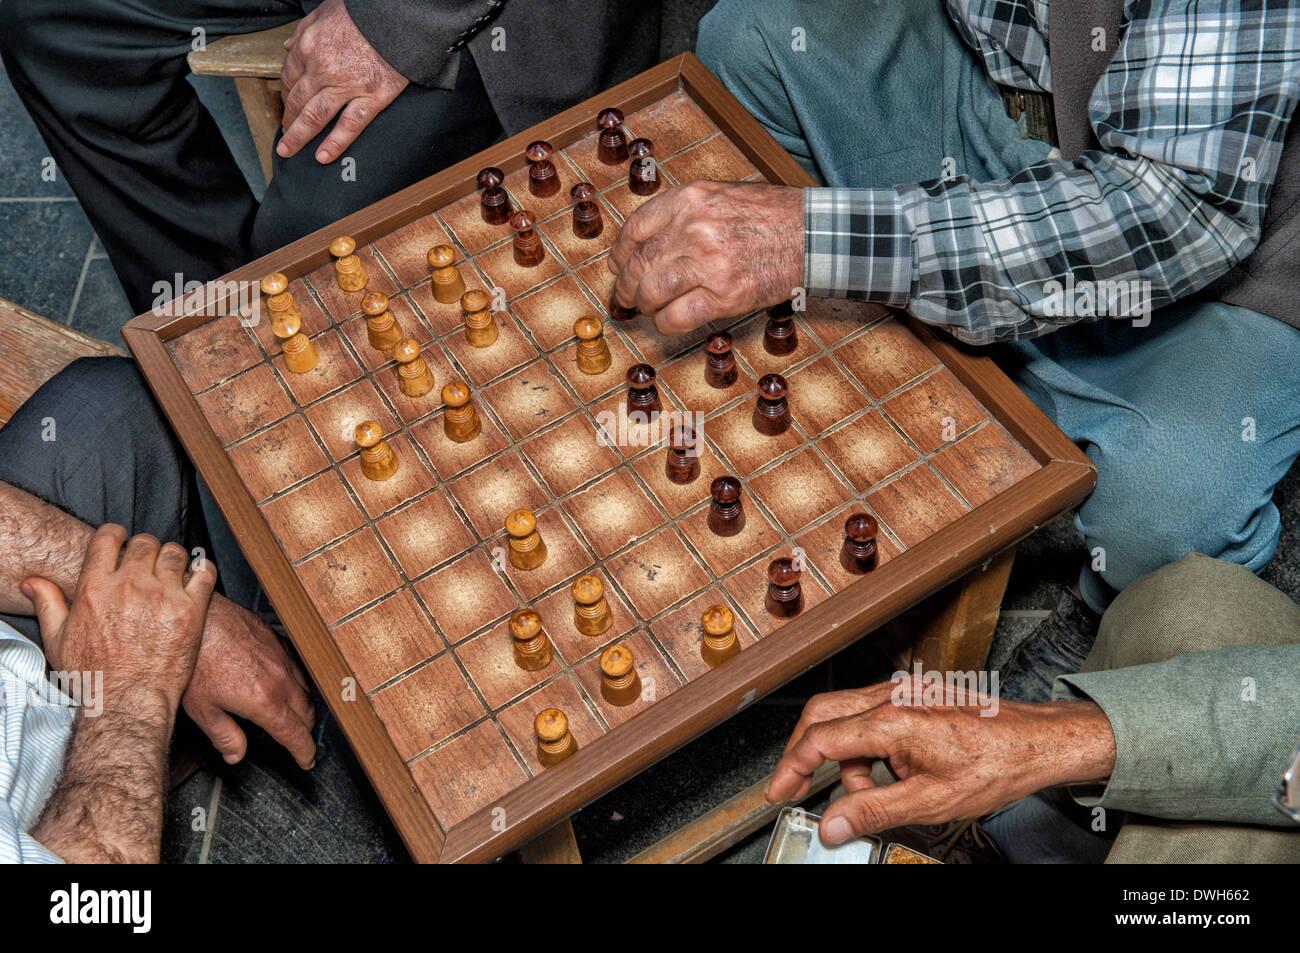 Man playing draughts, Urfa - Stock Image